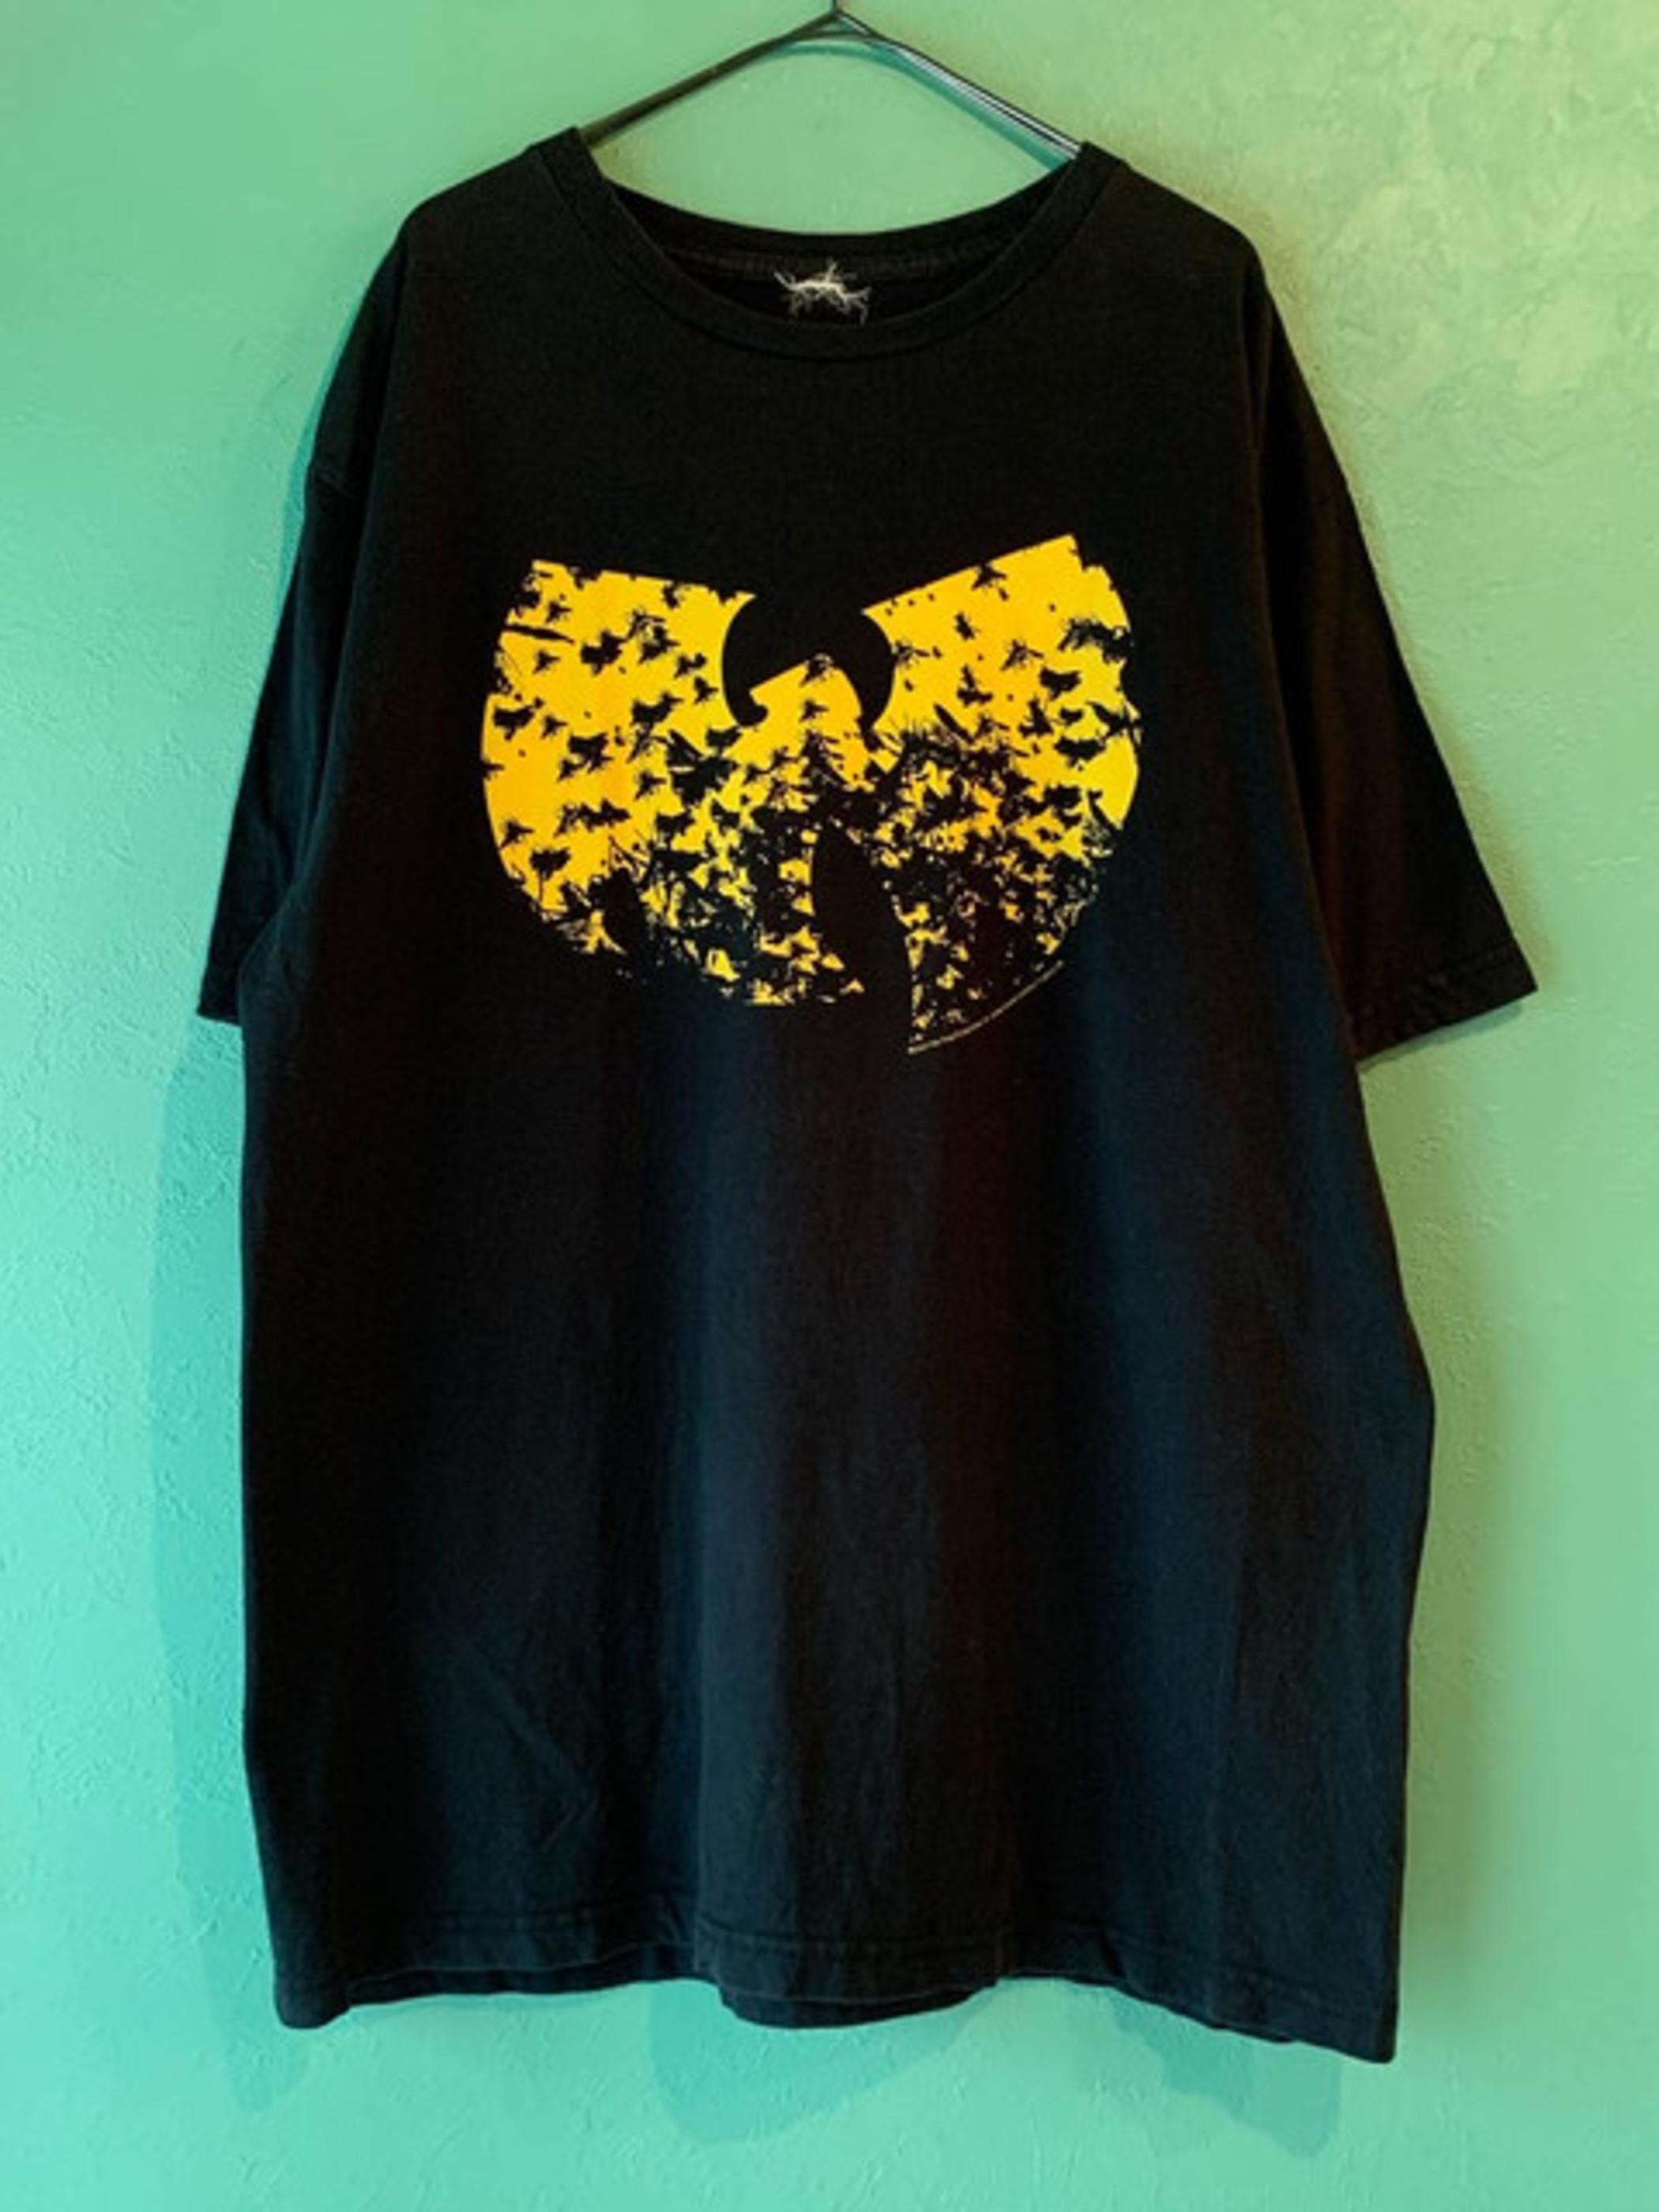 00s Wu-Tang Clan プリントTシャツ